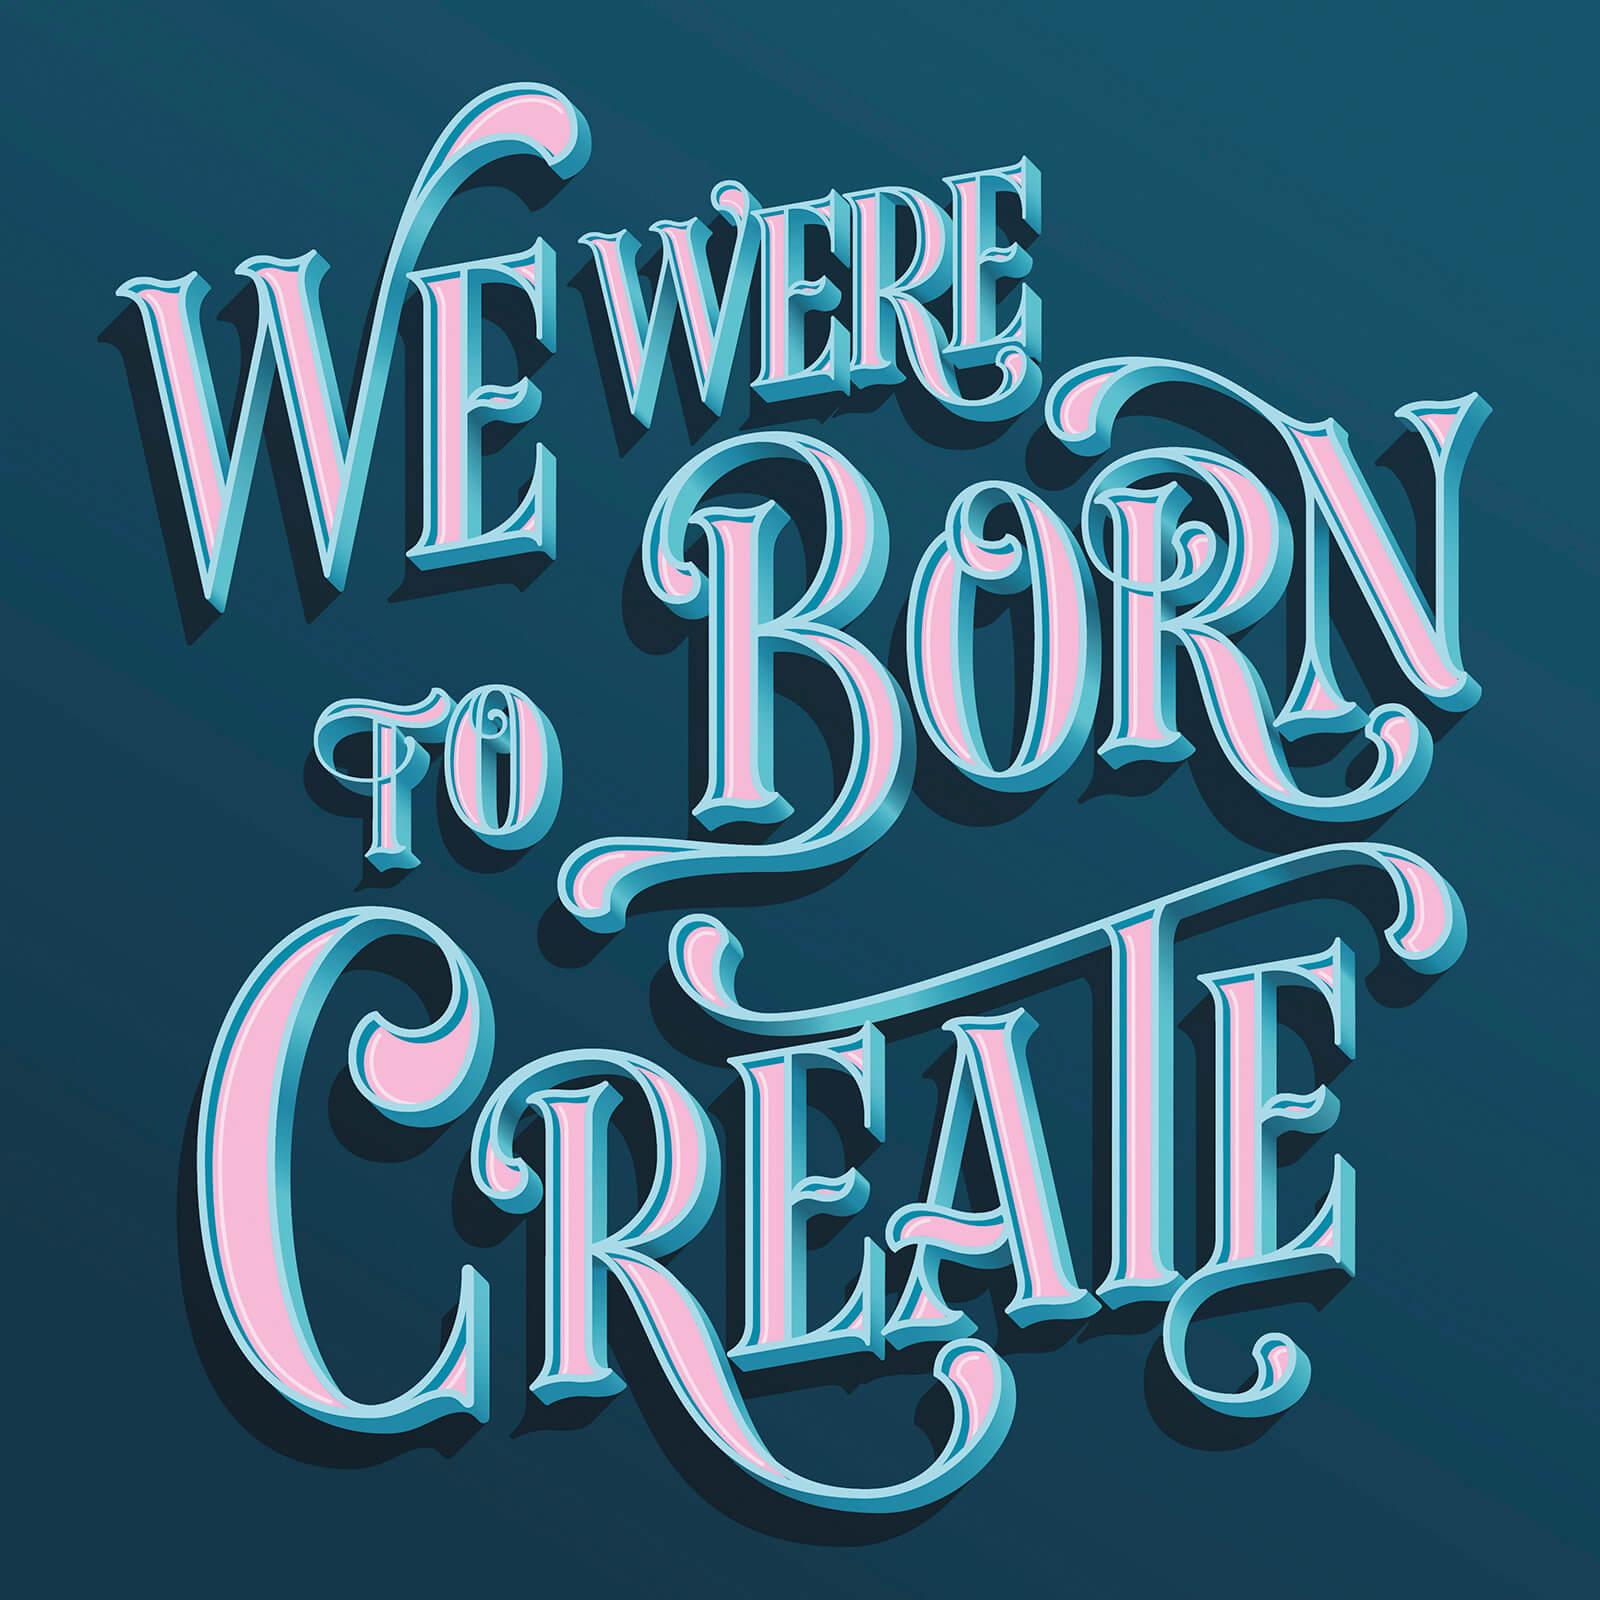 We were Born to Create - Ela Nahir